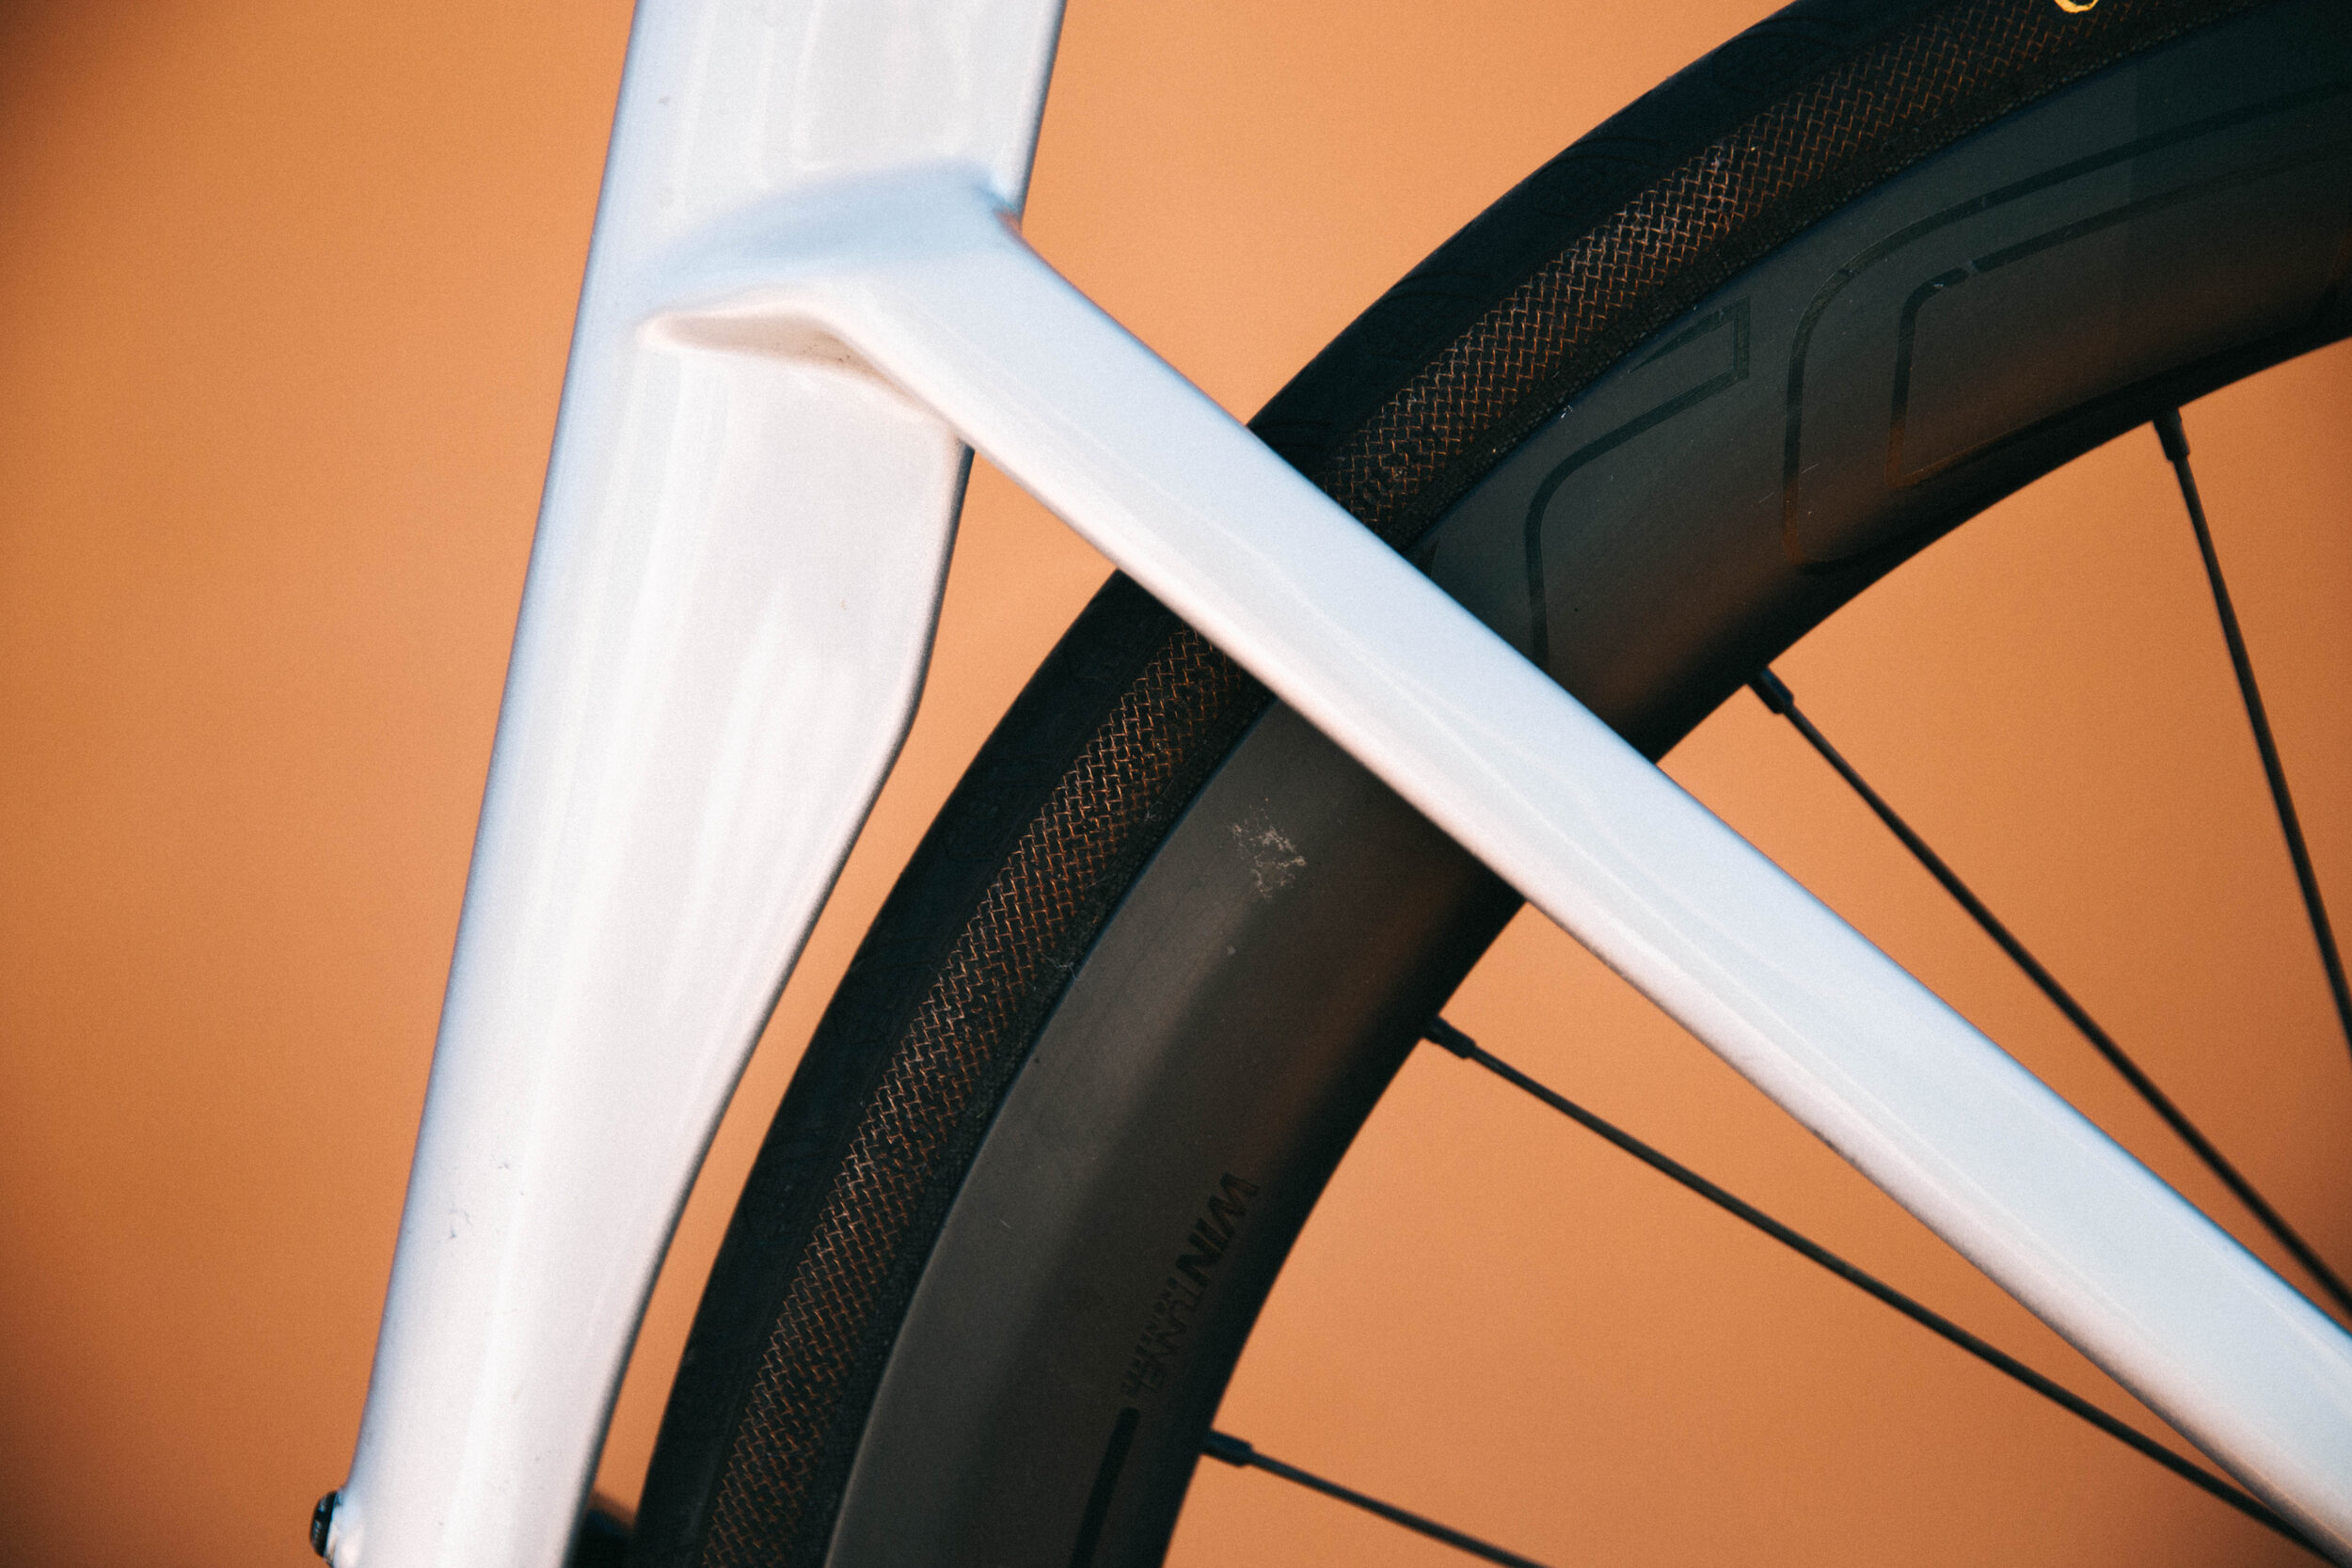 2018 Venge Rear Wheel Cutout.jpg